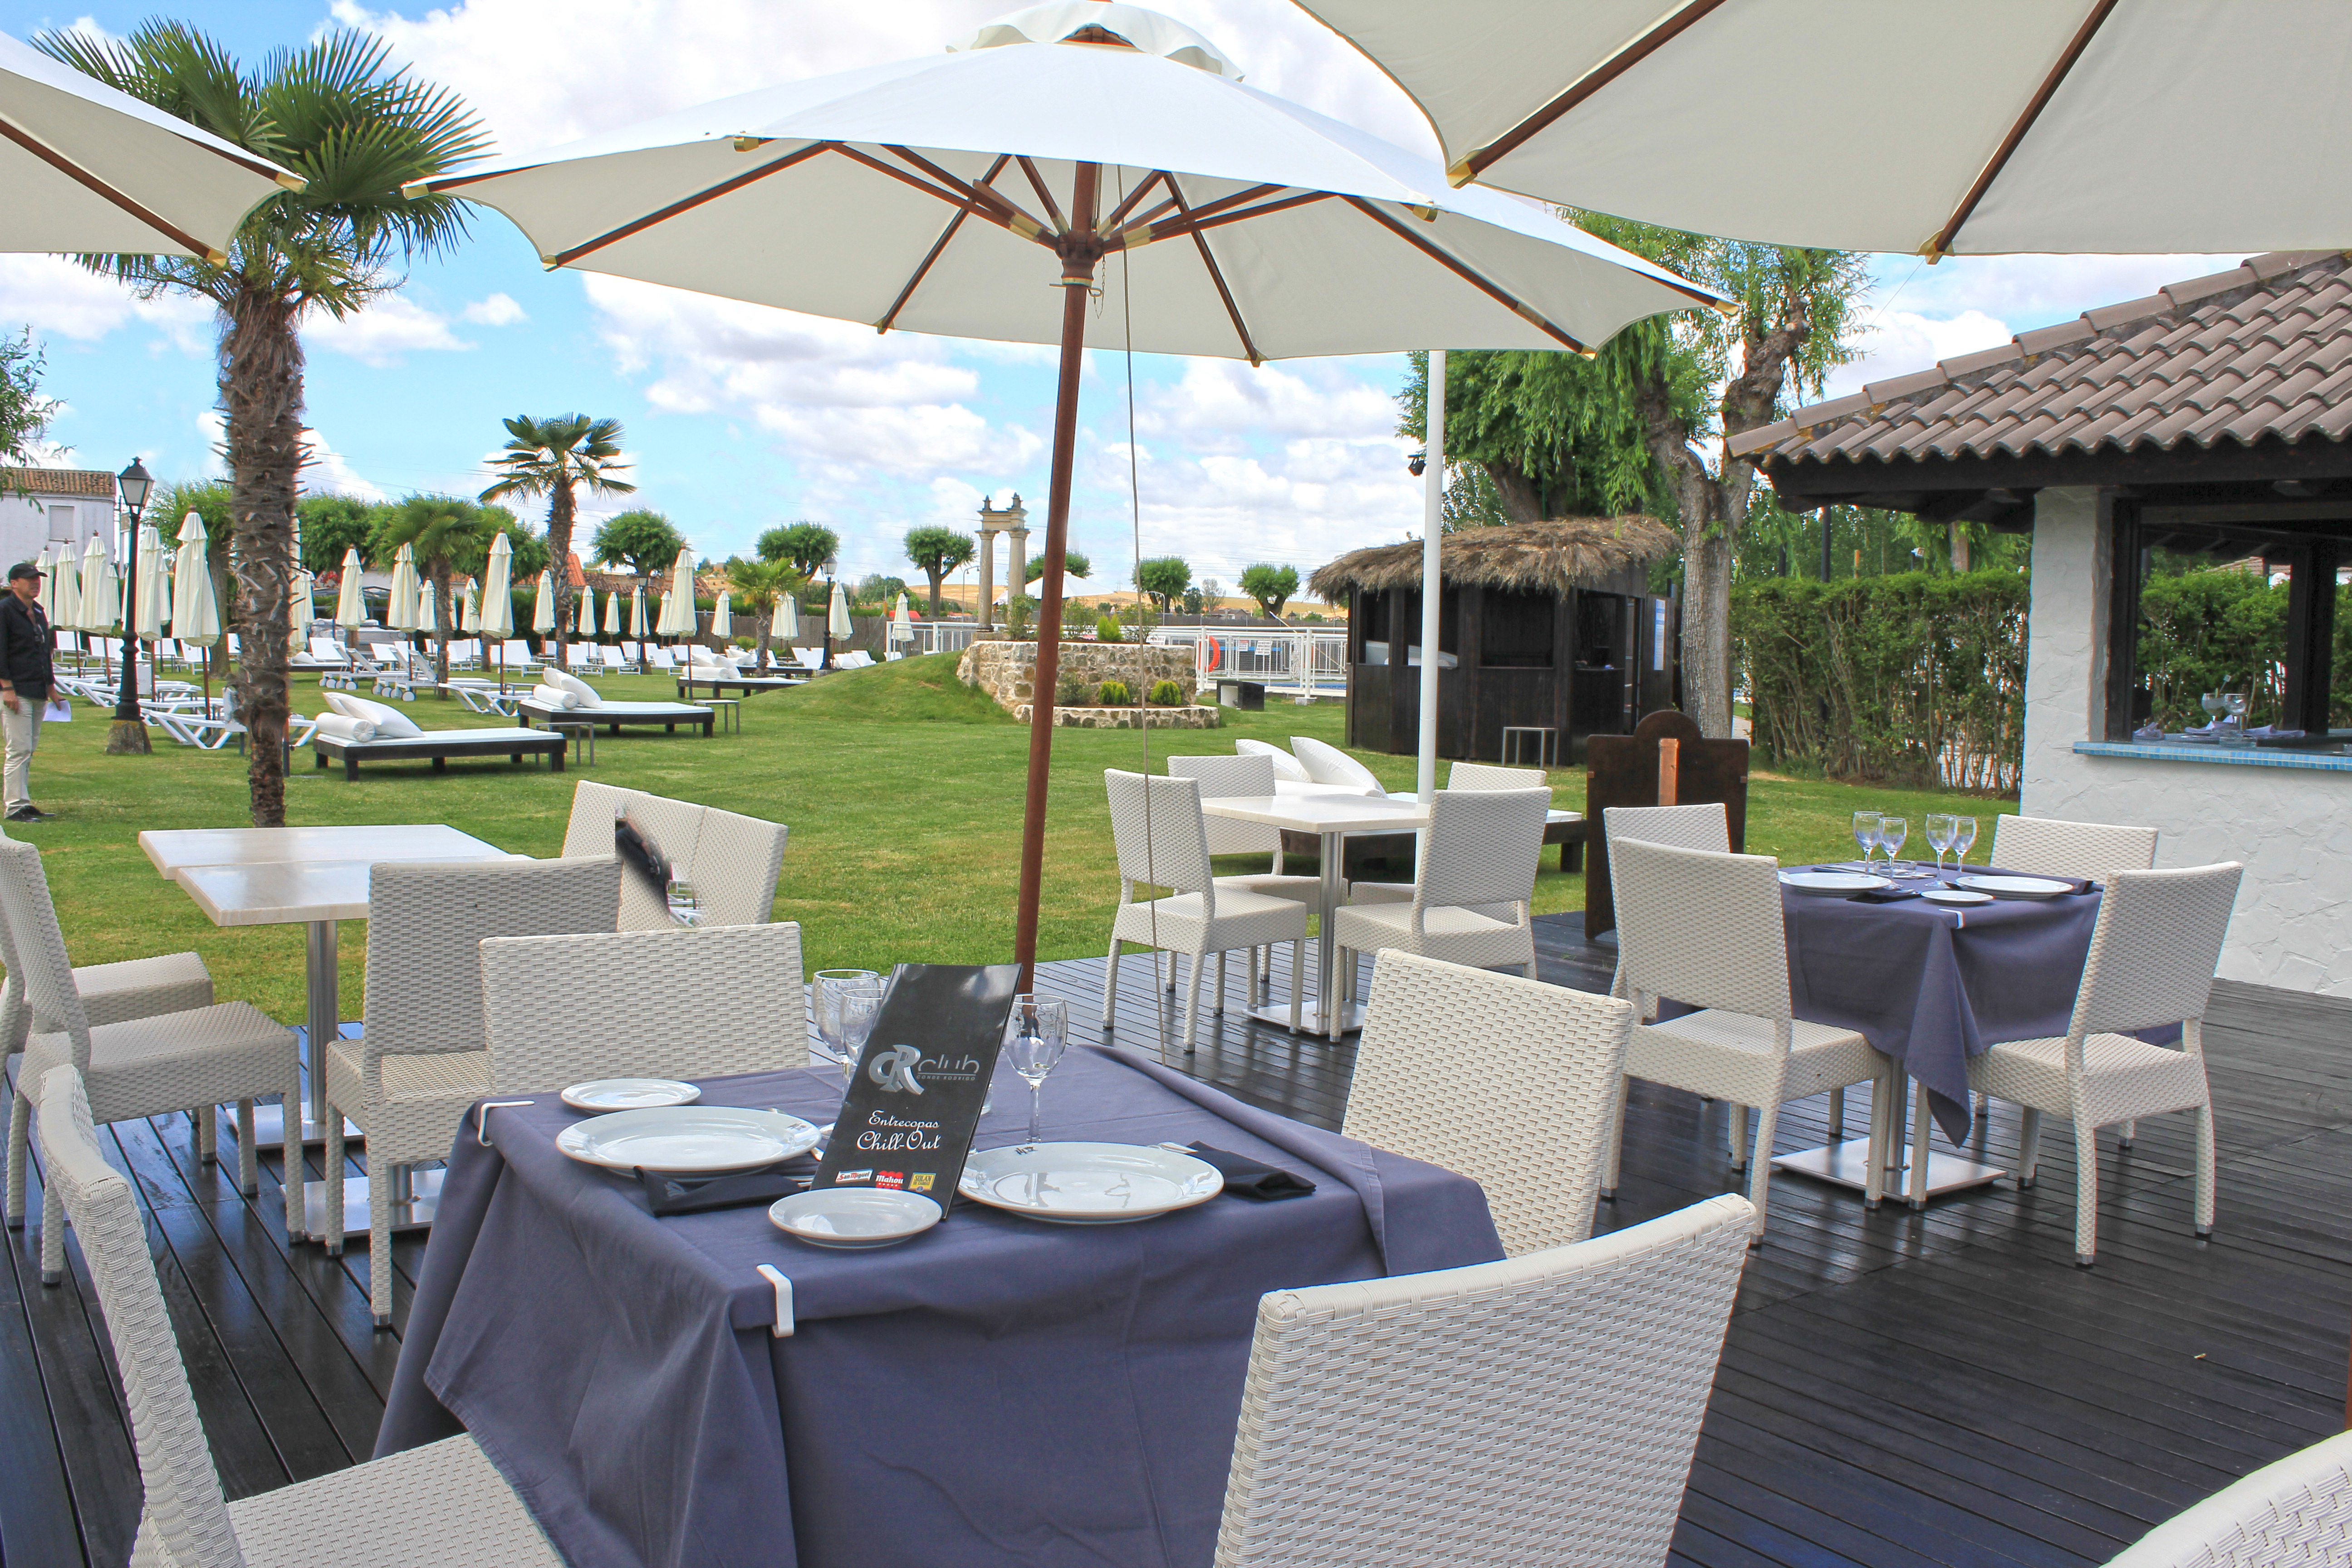 PISCINA CHILL OUT | Hoteles Conde rodrigo Blog